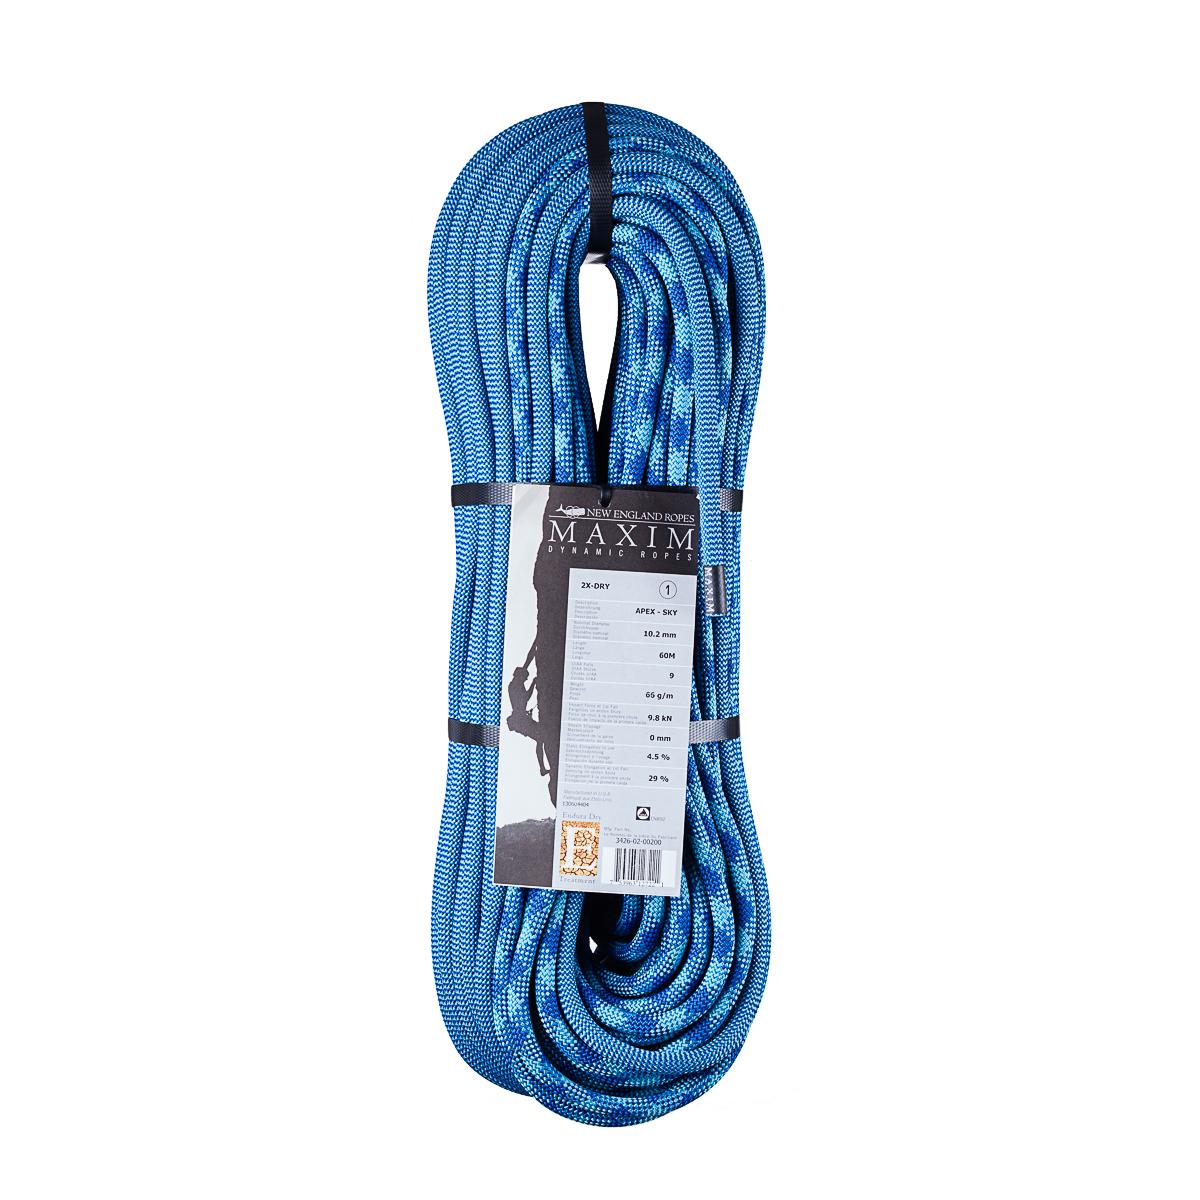 Maxim Ropes Apex 10.2mm 2X-Dry   Single Ropes   EpicTV Shop